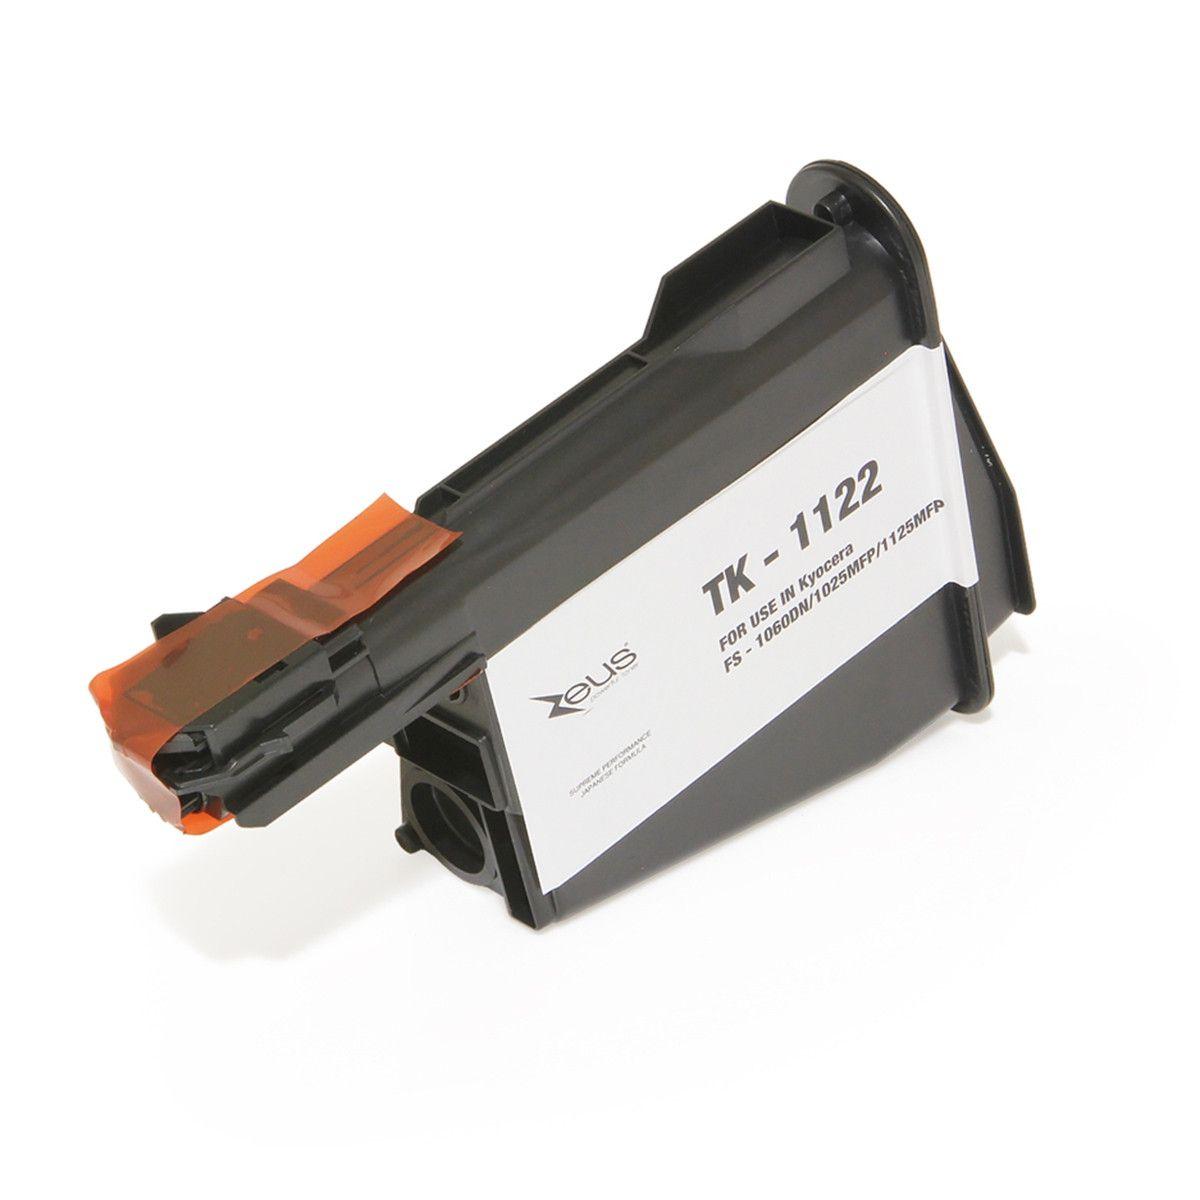 Toner compatível com KYOCERA TK1122 FS1060 FS1025 FS1125 1060DN 1025MFP 1125MFP 3.000 Páginas - Cartucho & Cia